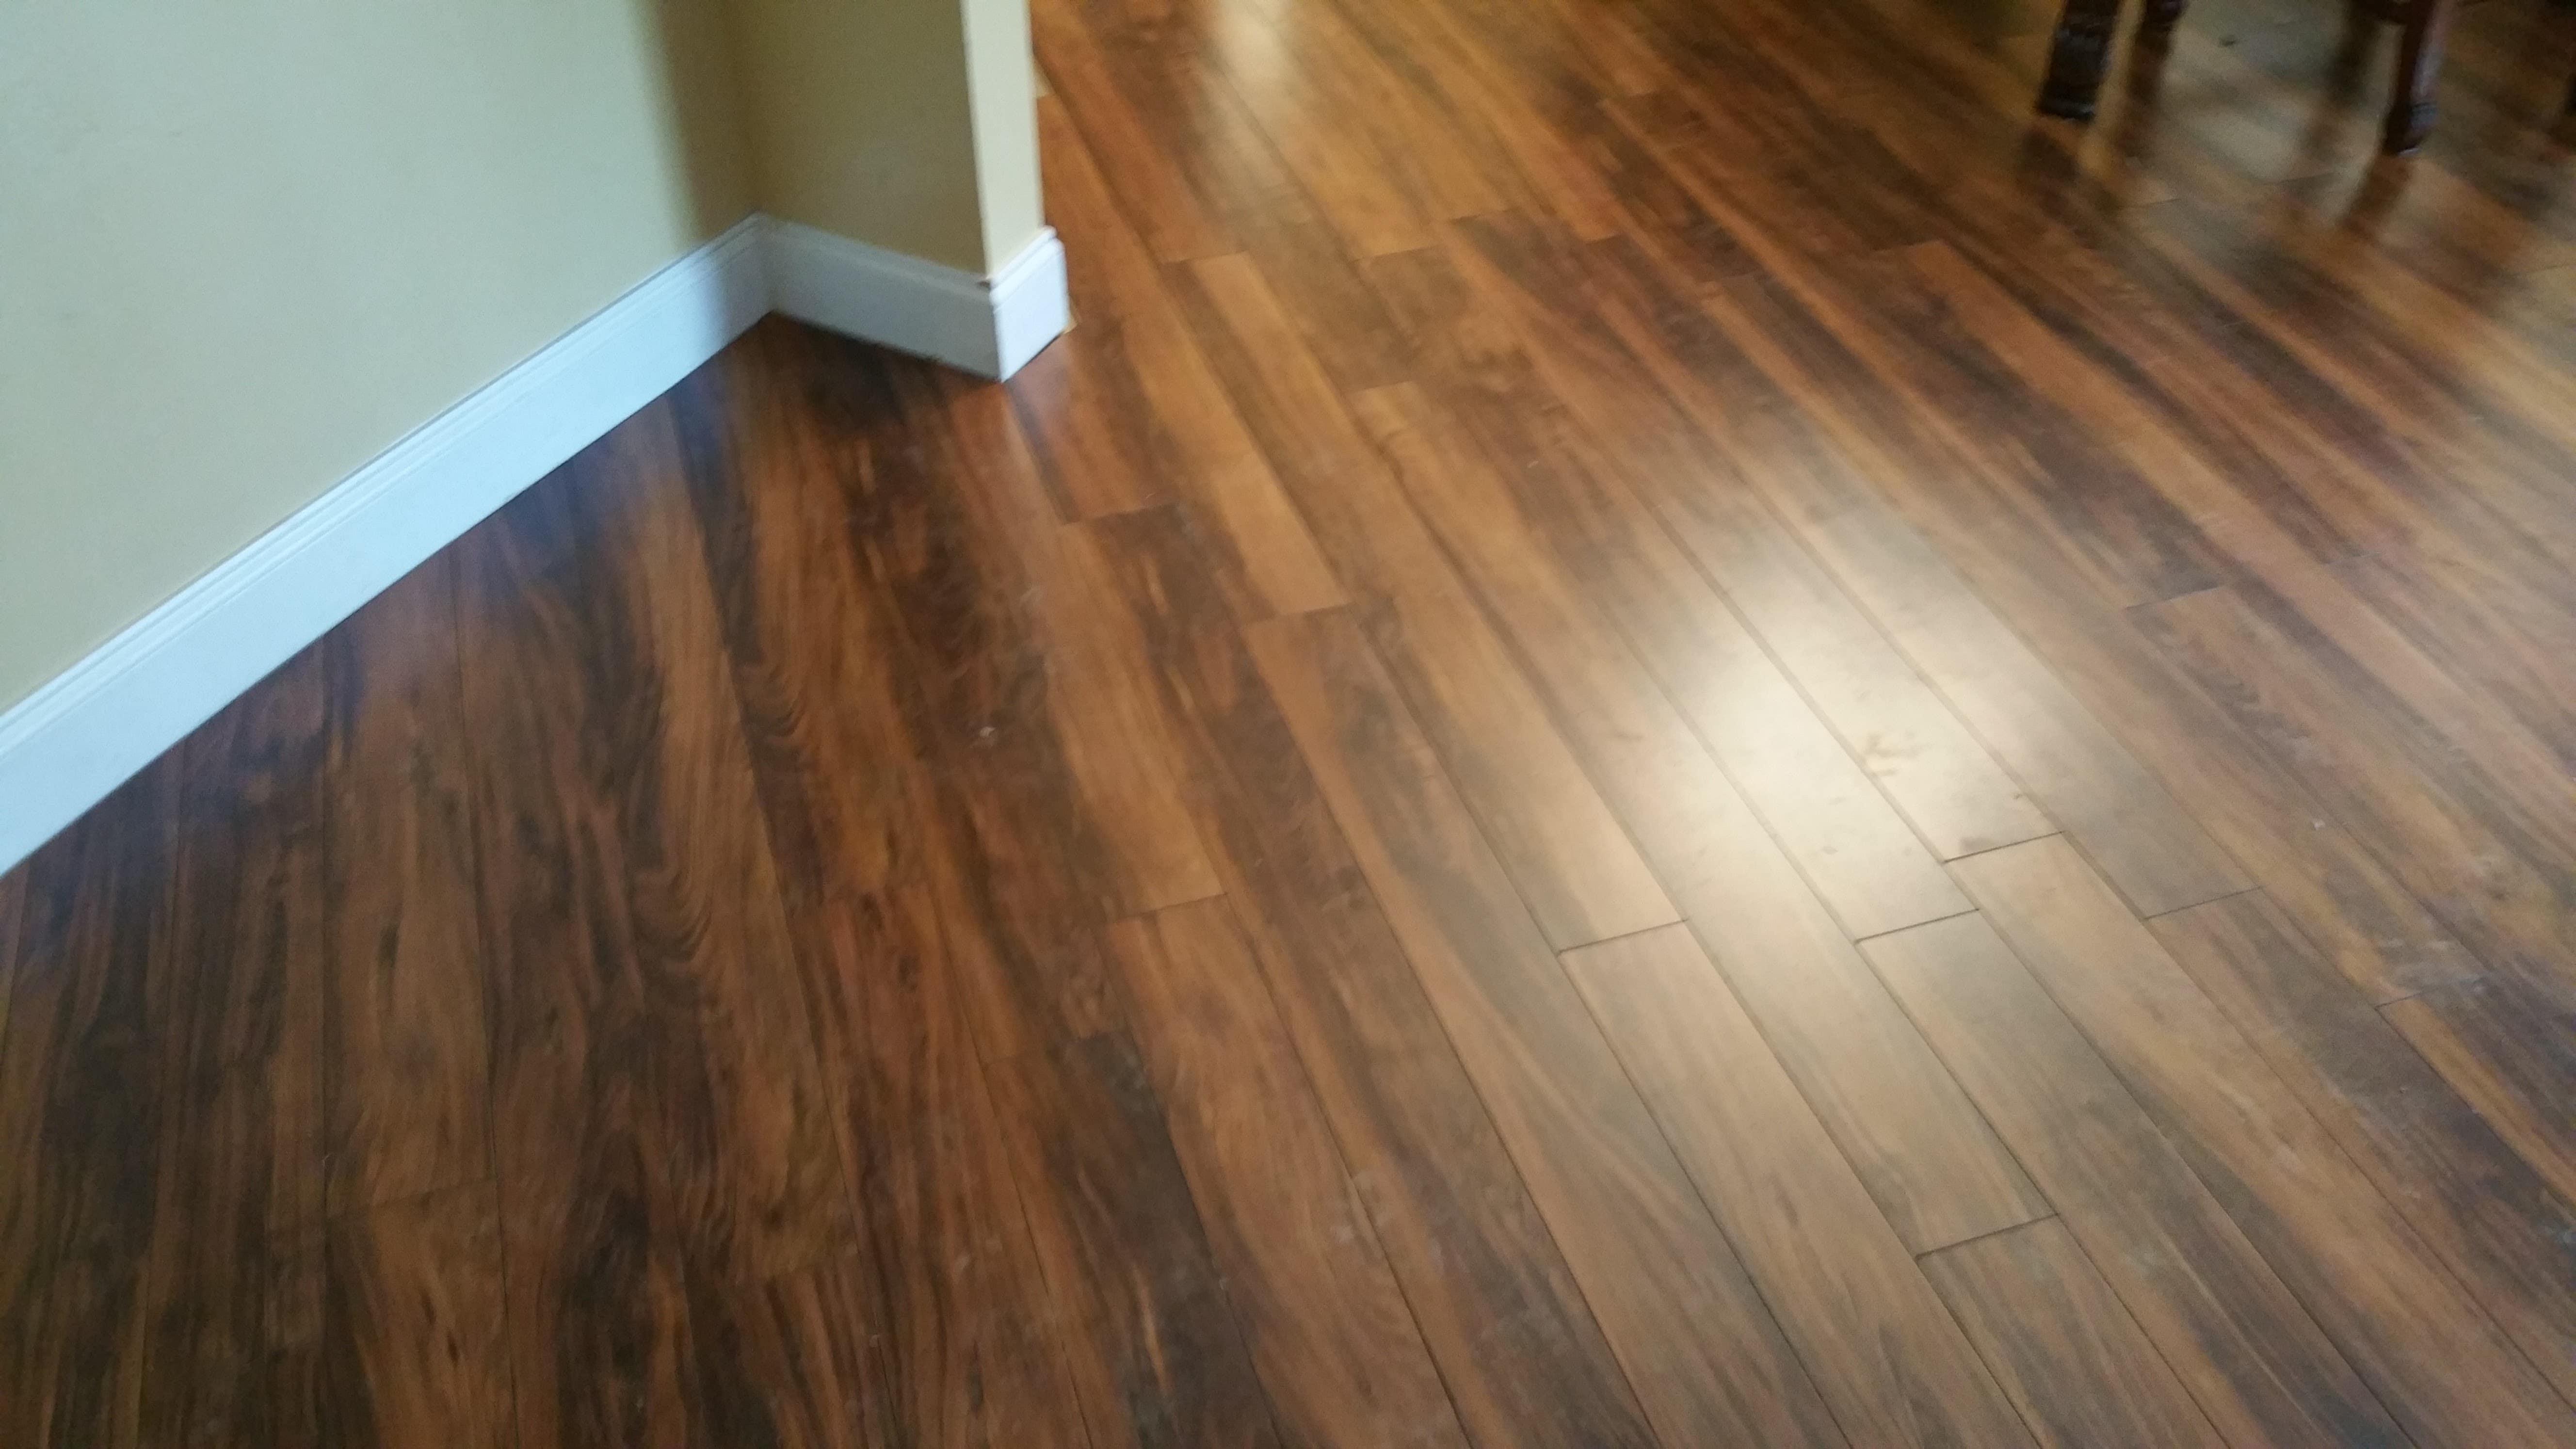 Hardwood flooring refinishing repair installation for Wood floor maintenance